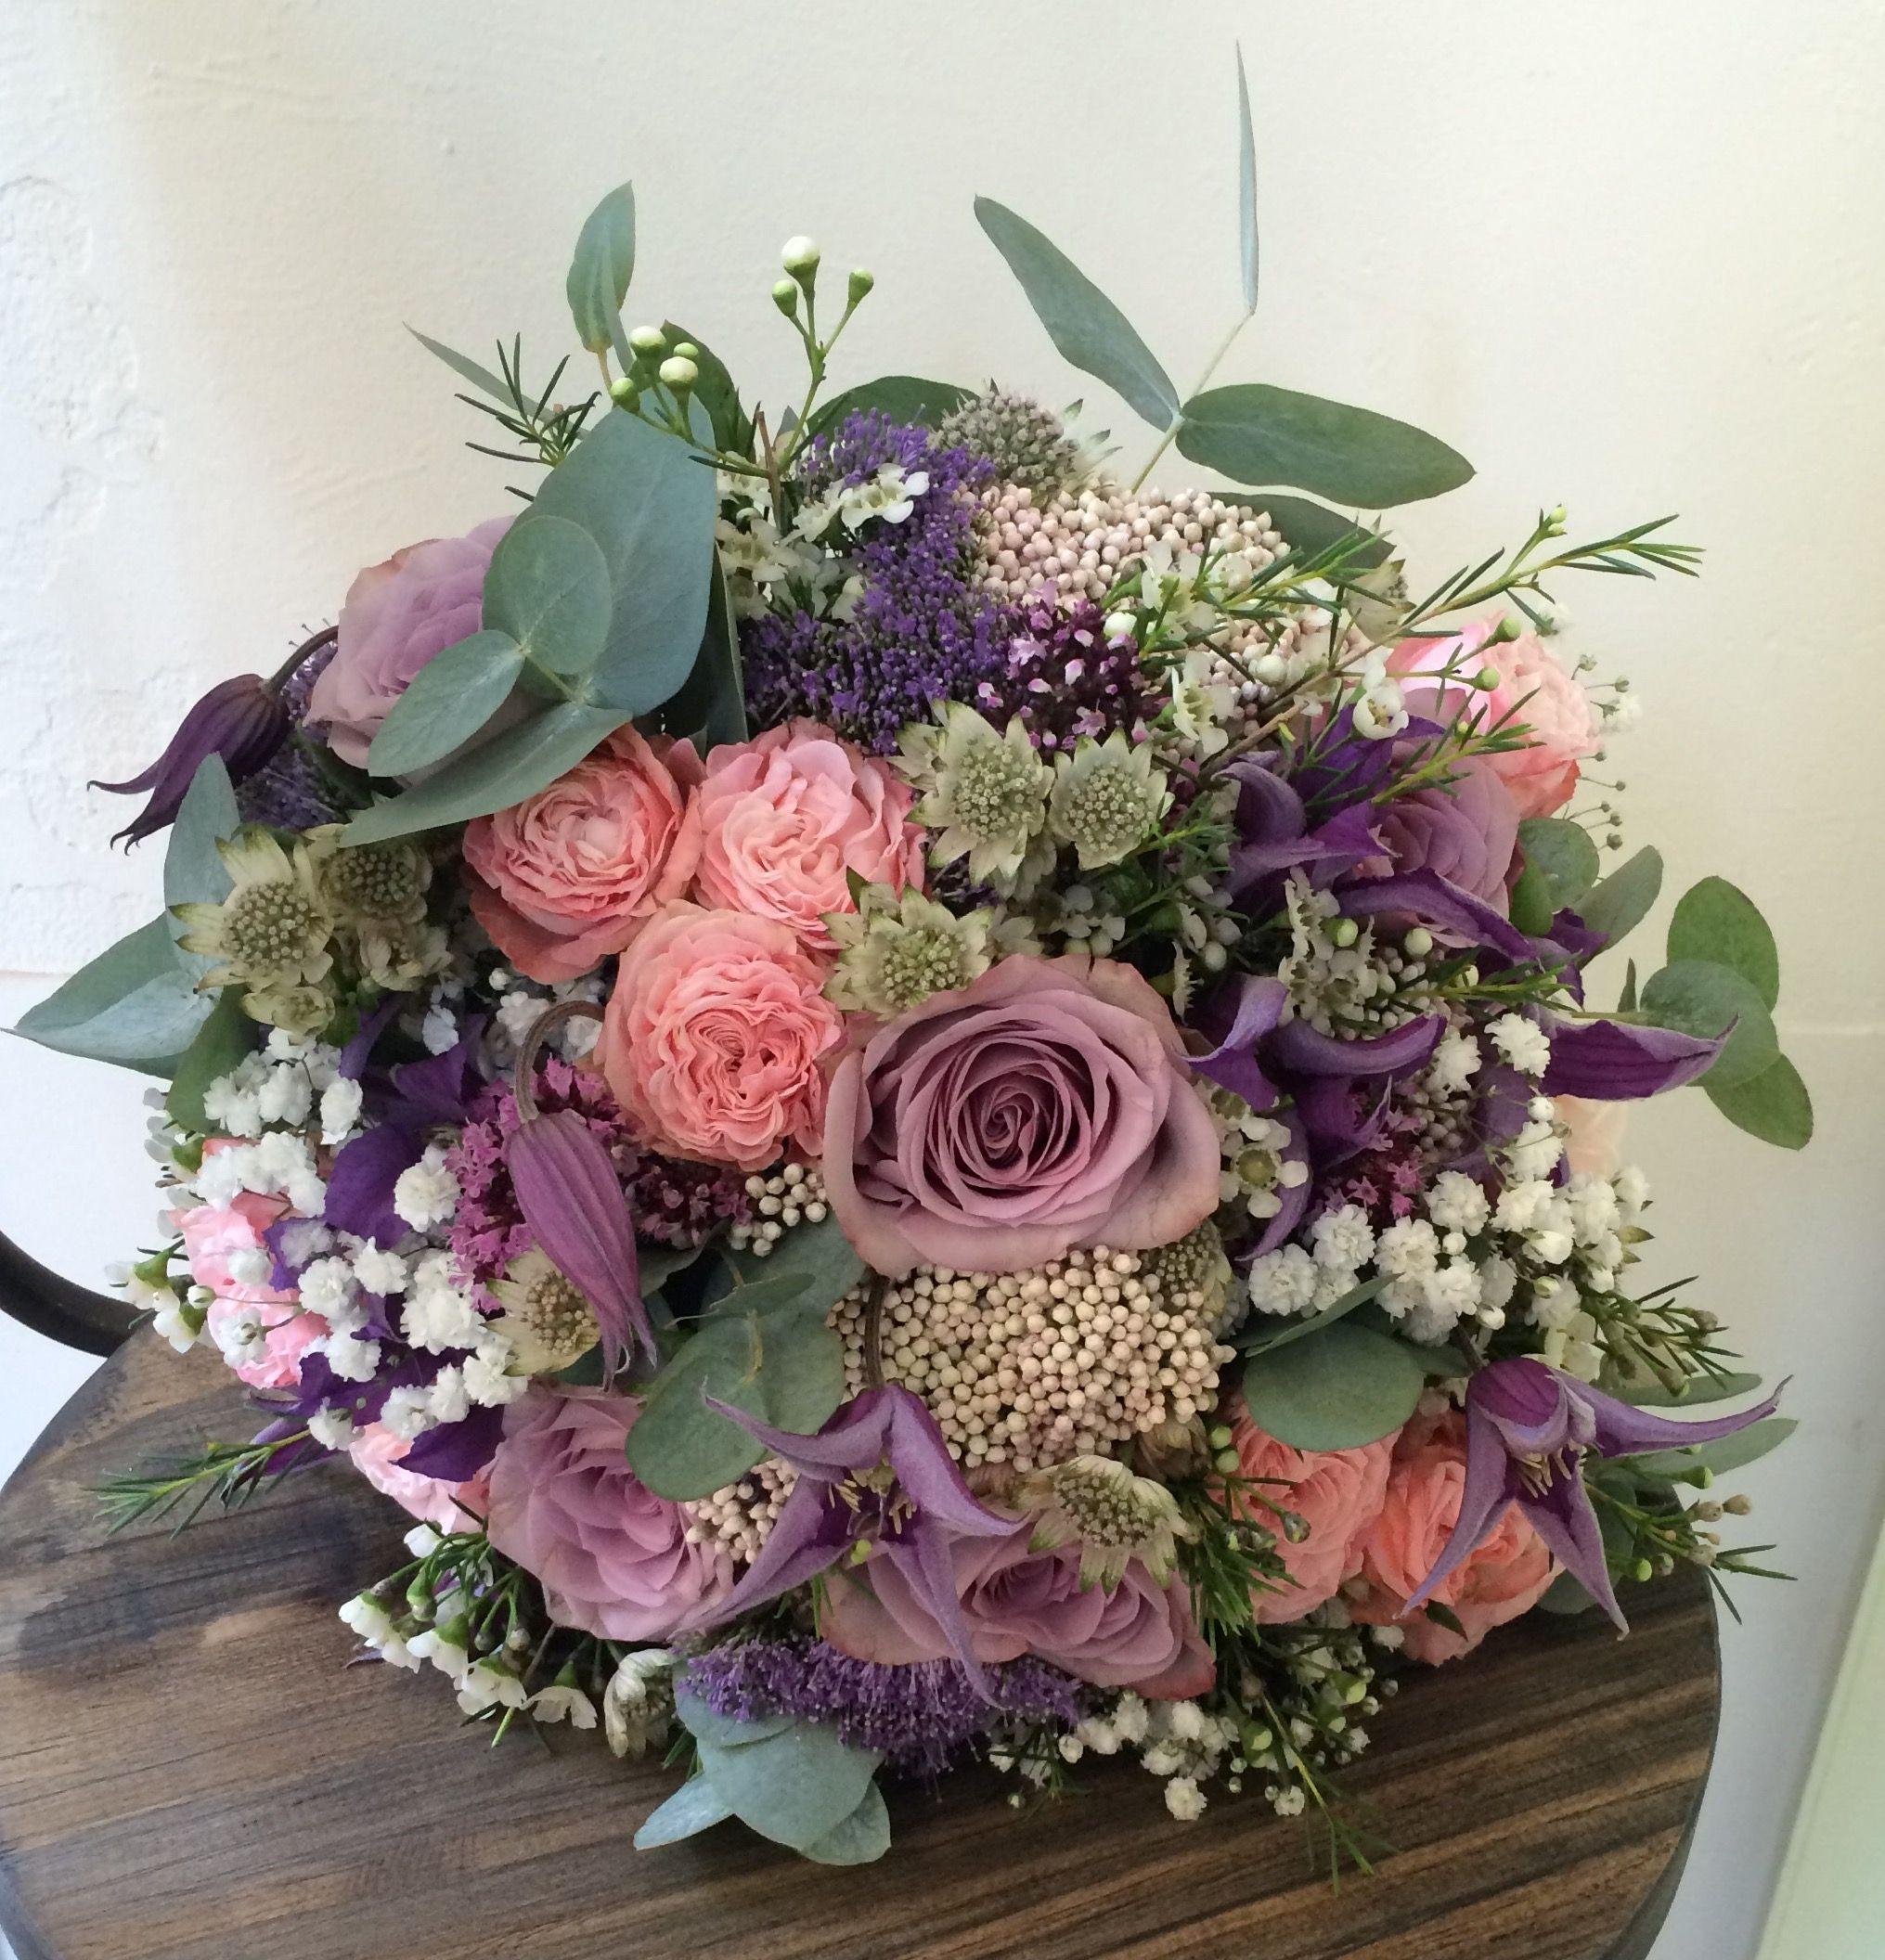 Gorgeous Bridal Bouquet Mixed Flowers And Textures Mauve Purple Grey C